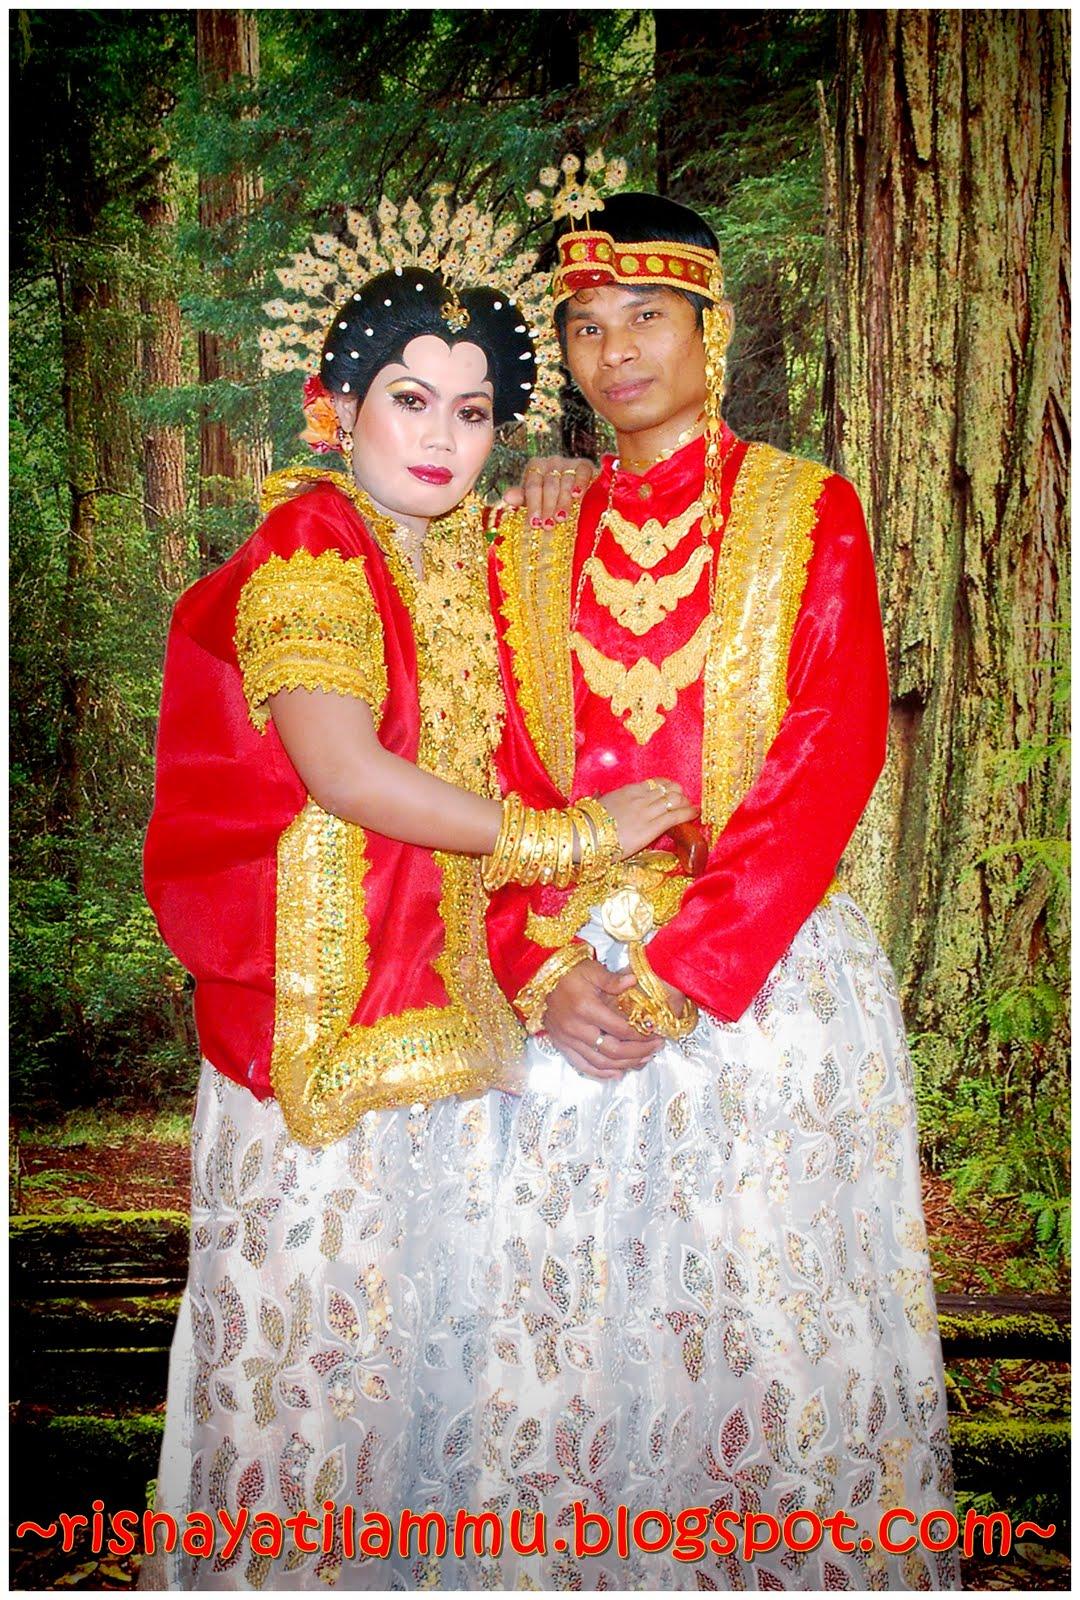 nie lah baju adat perkahwinan bangsa Bugis ::